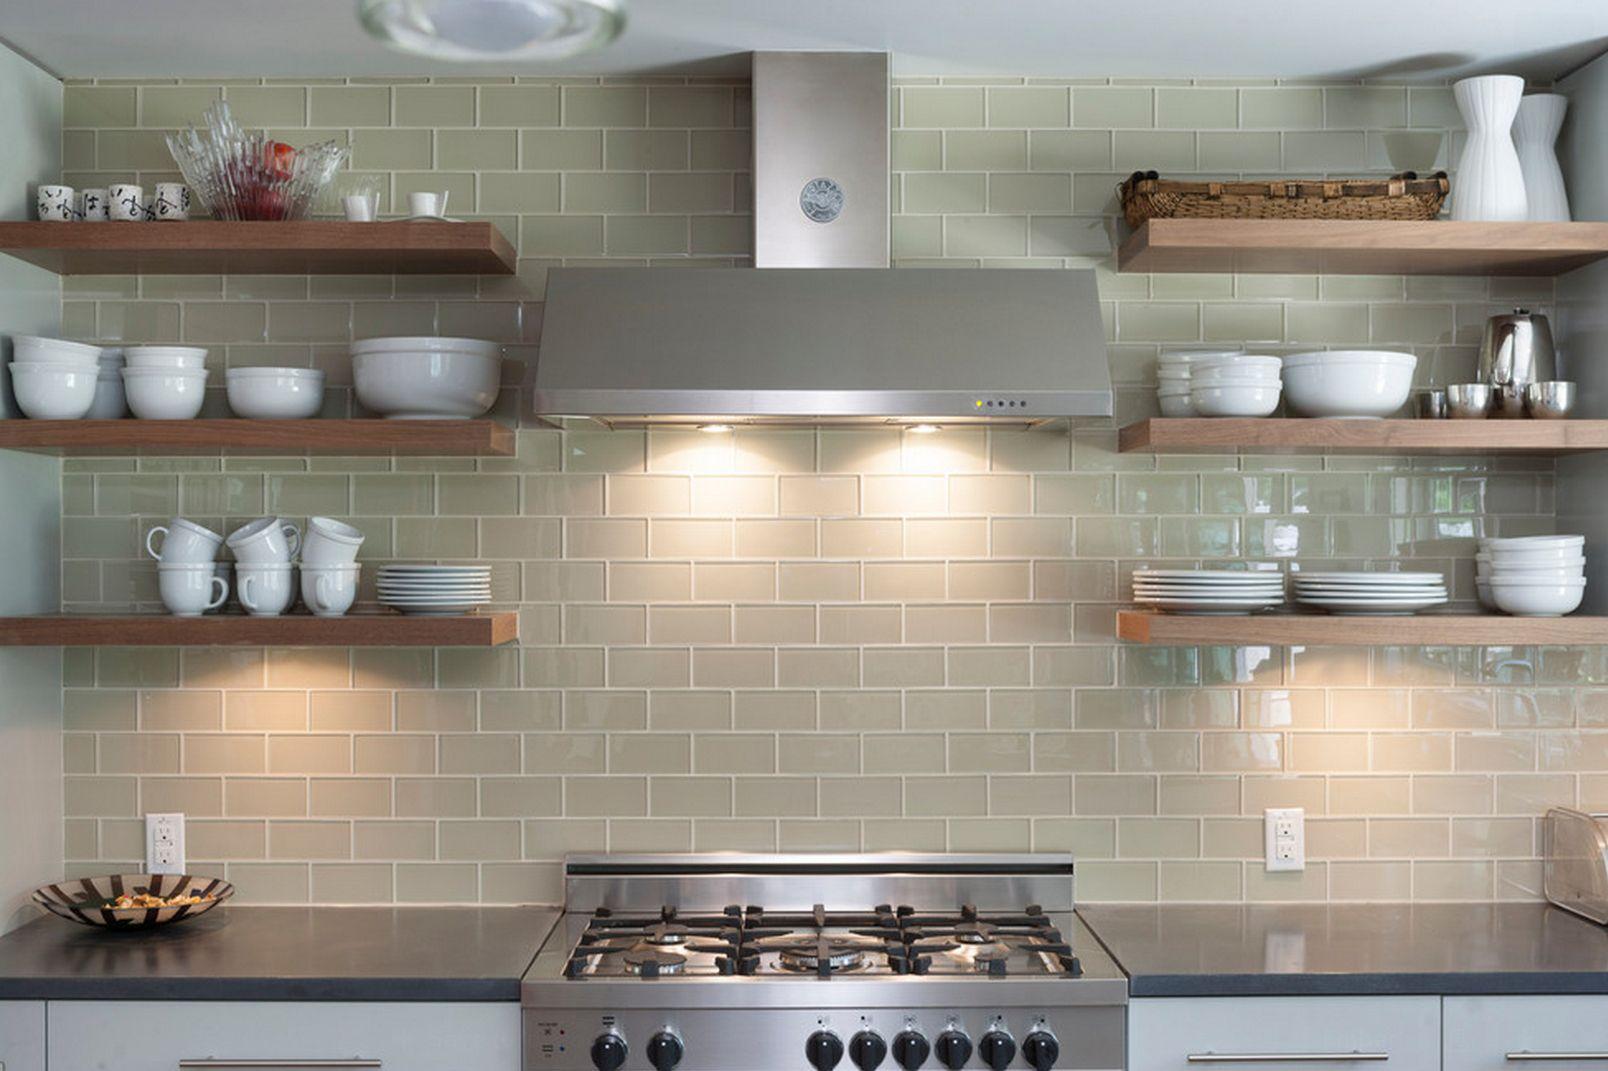 superior Decorative Tiles For Kitchen Walls #7: tiles ...